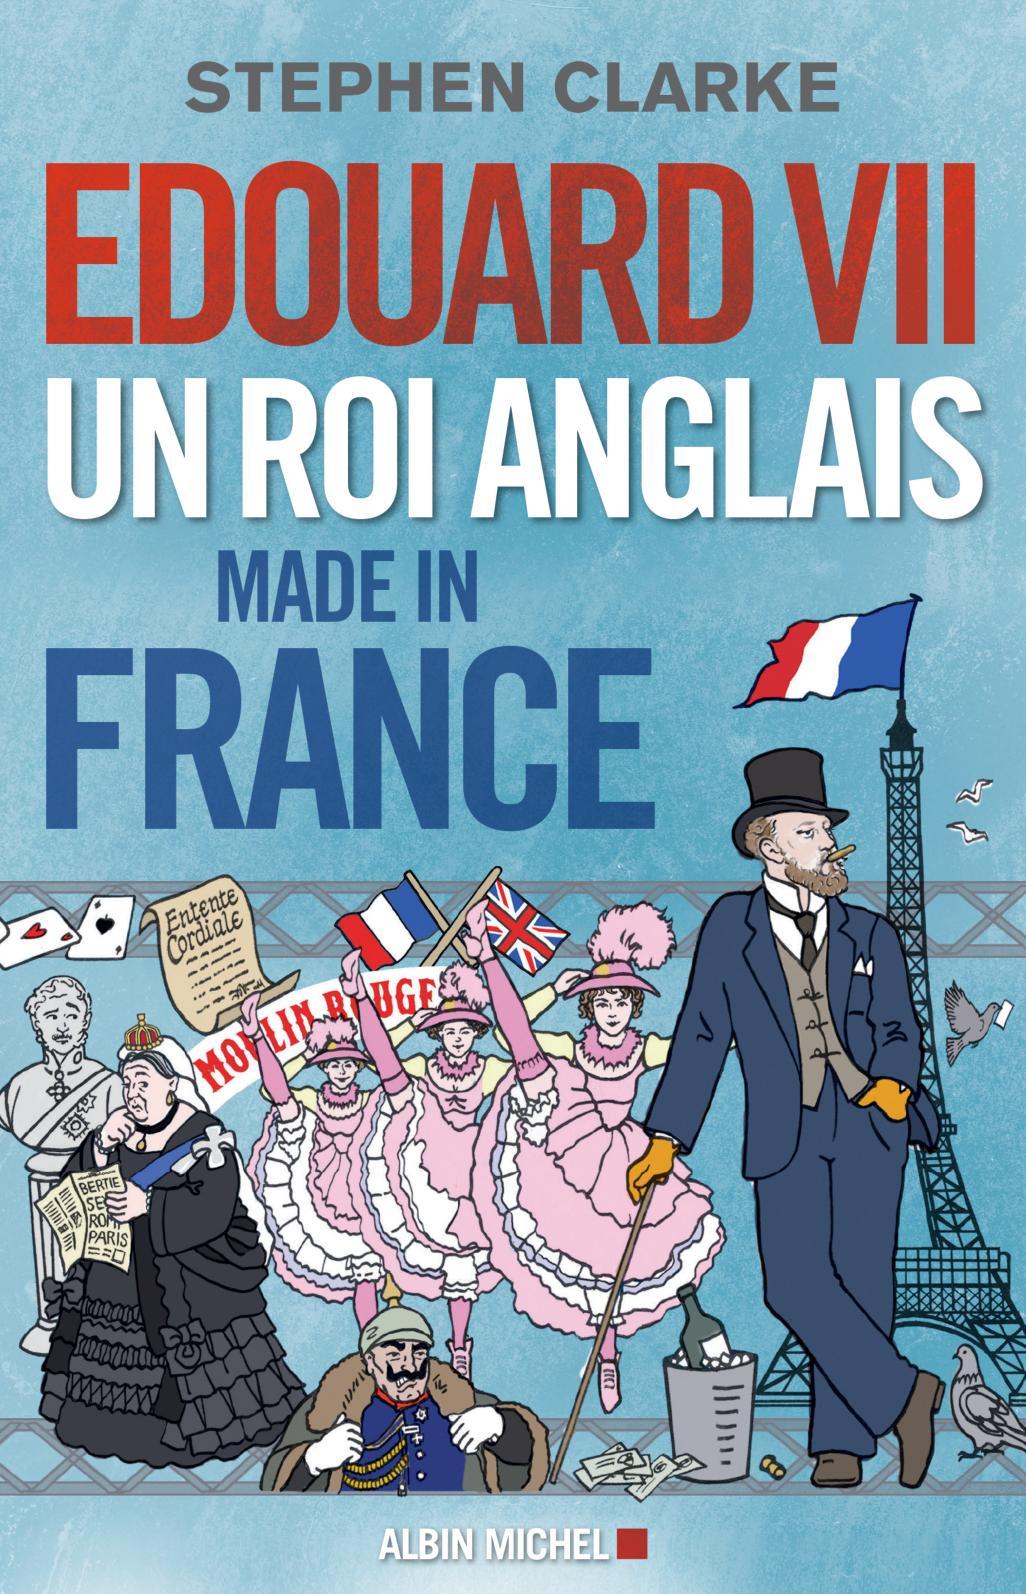 EXTRAIT | Edouard VII - Stephen Clarke